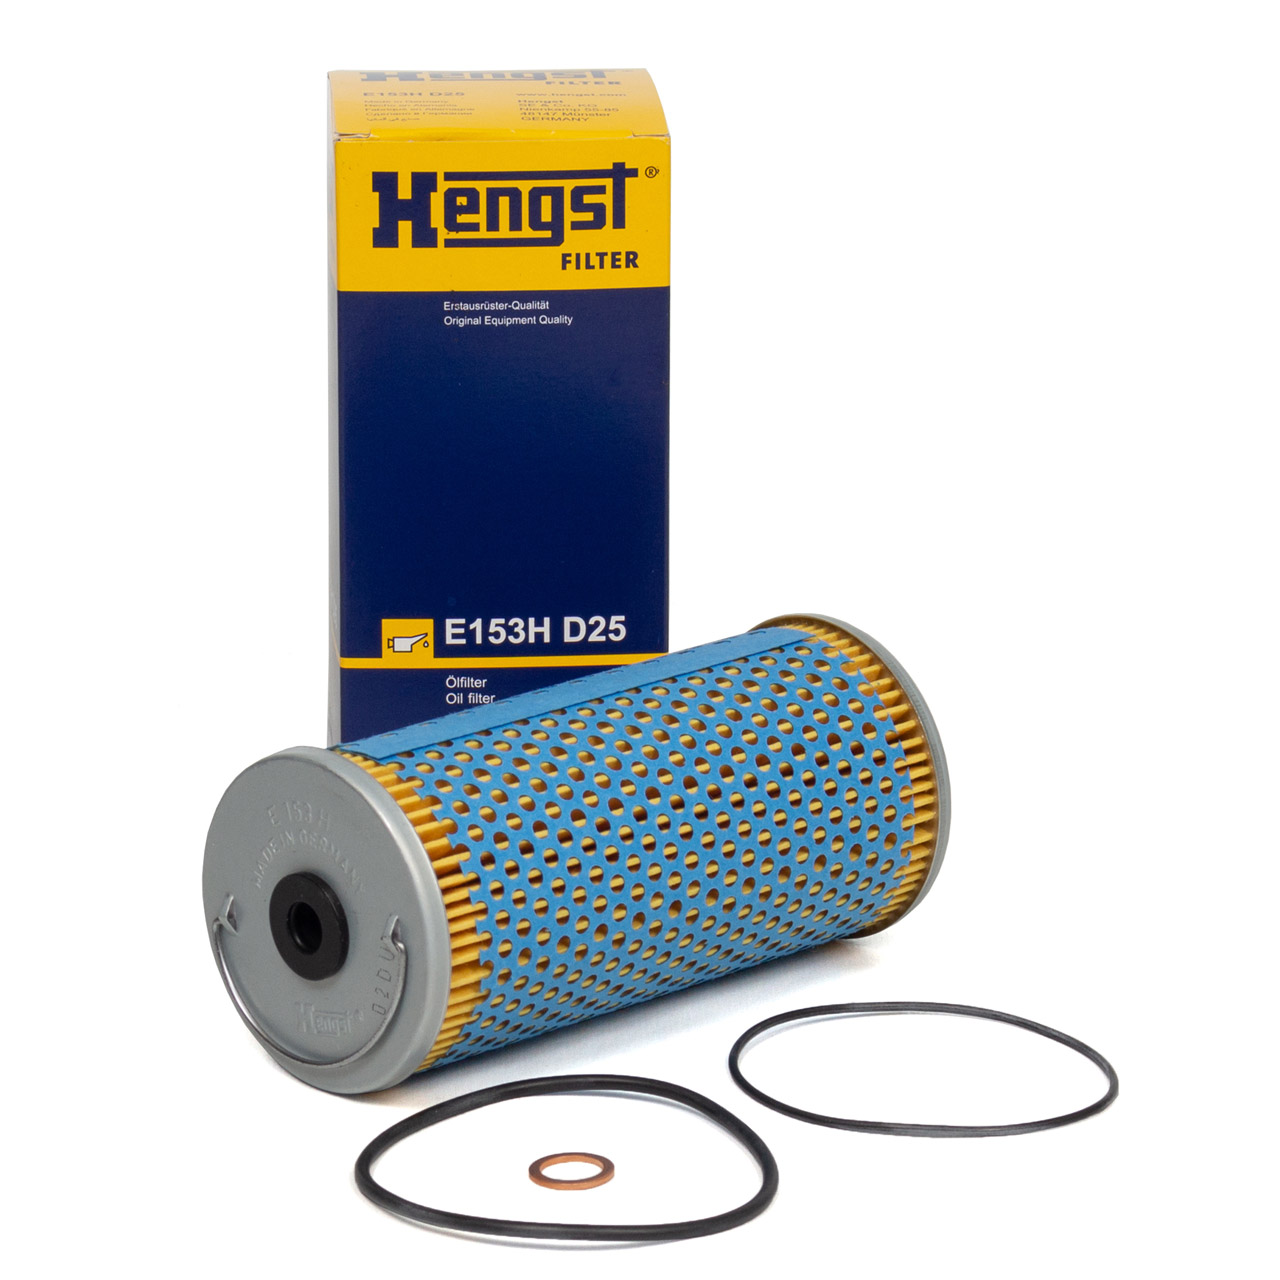 HENGST E153HD25 Ölfilter MERCEDES W124 W210 S210 W140 C140 R129 420 500 50/60AMG